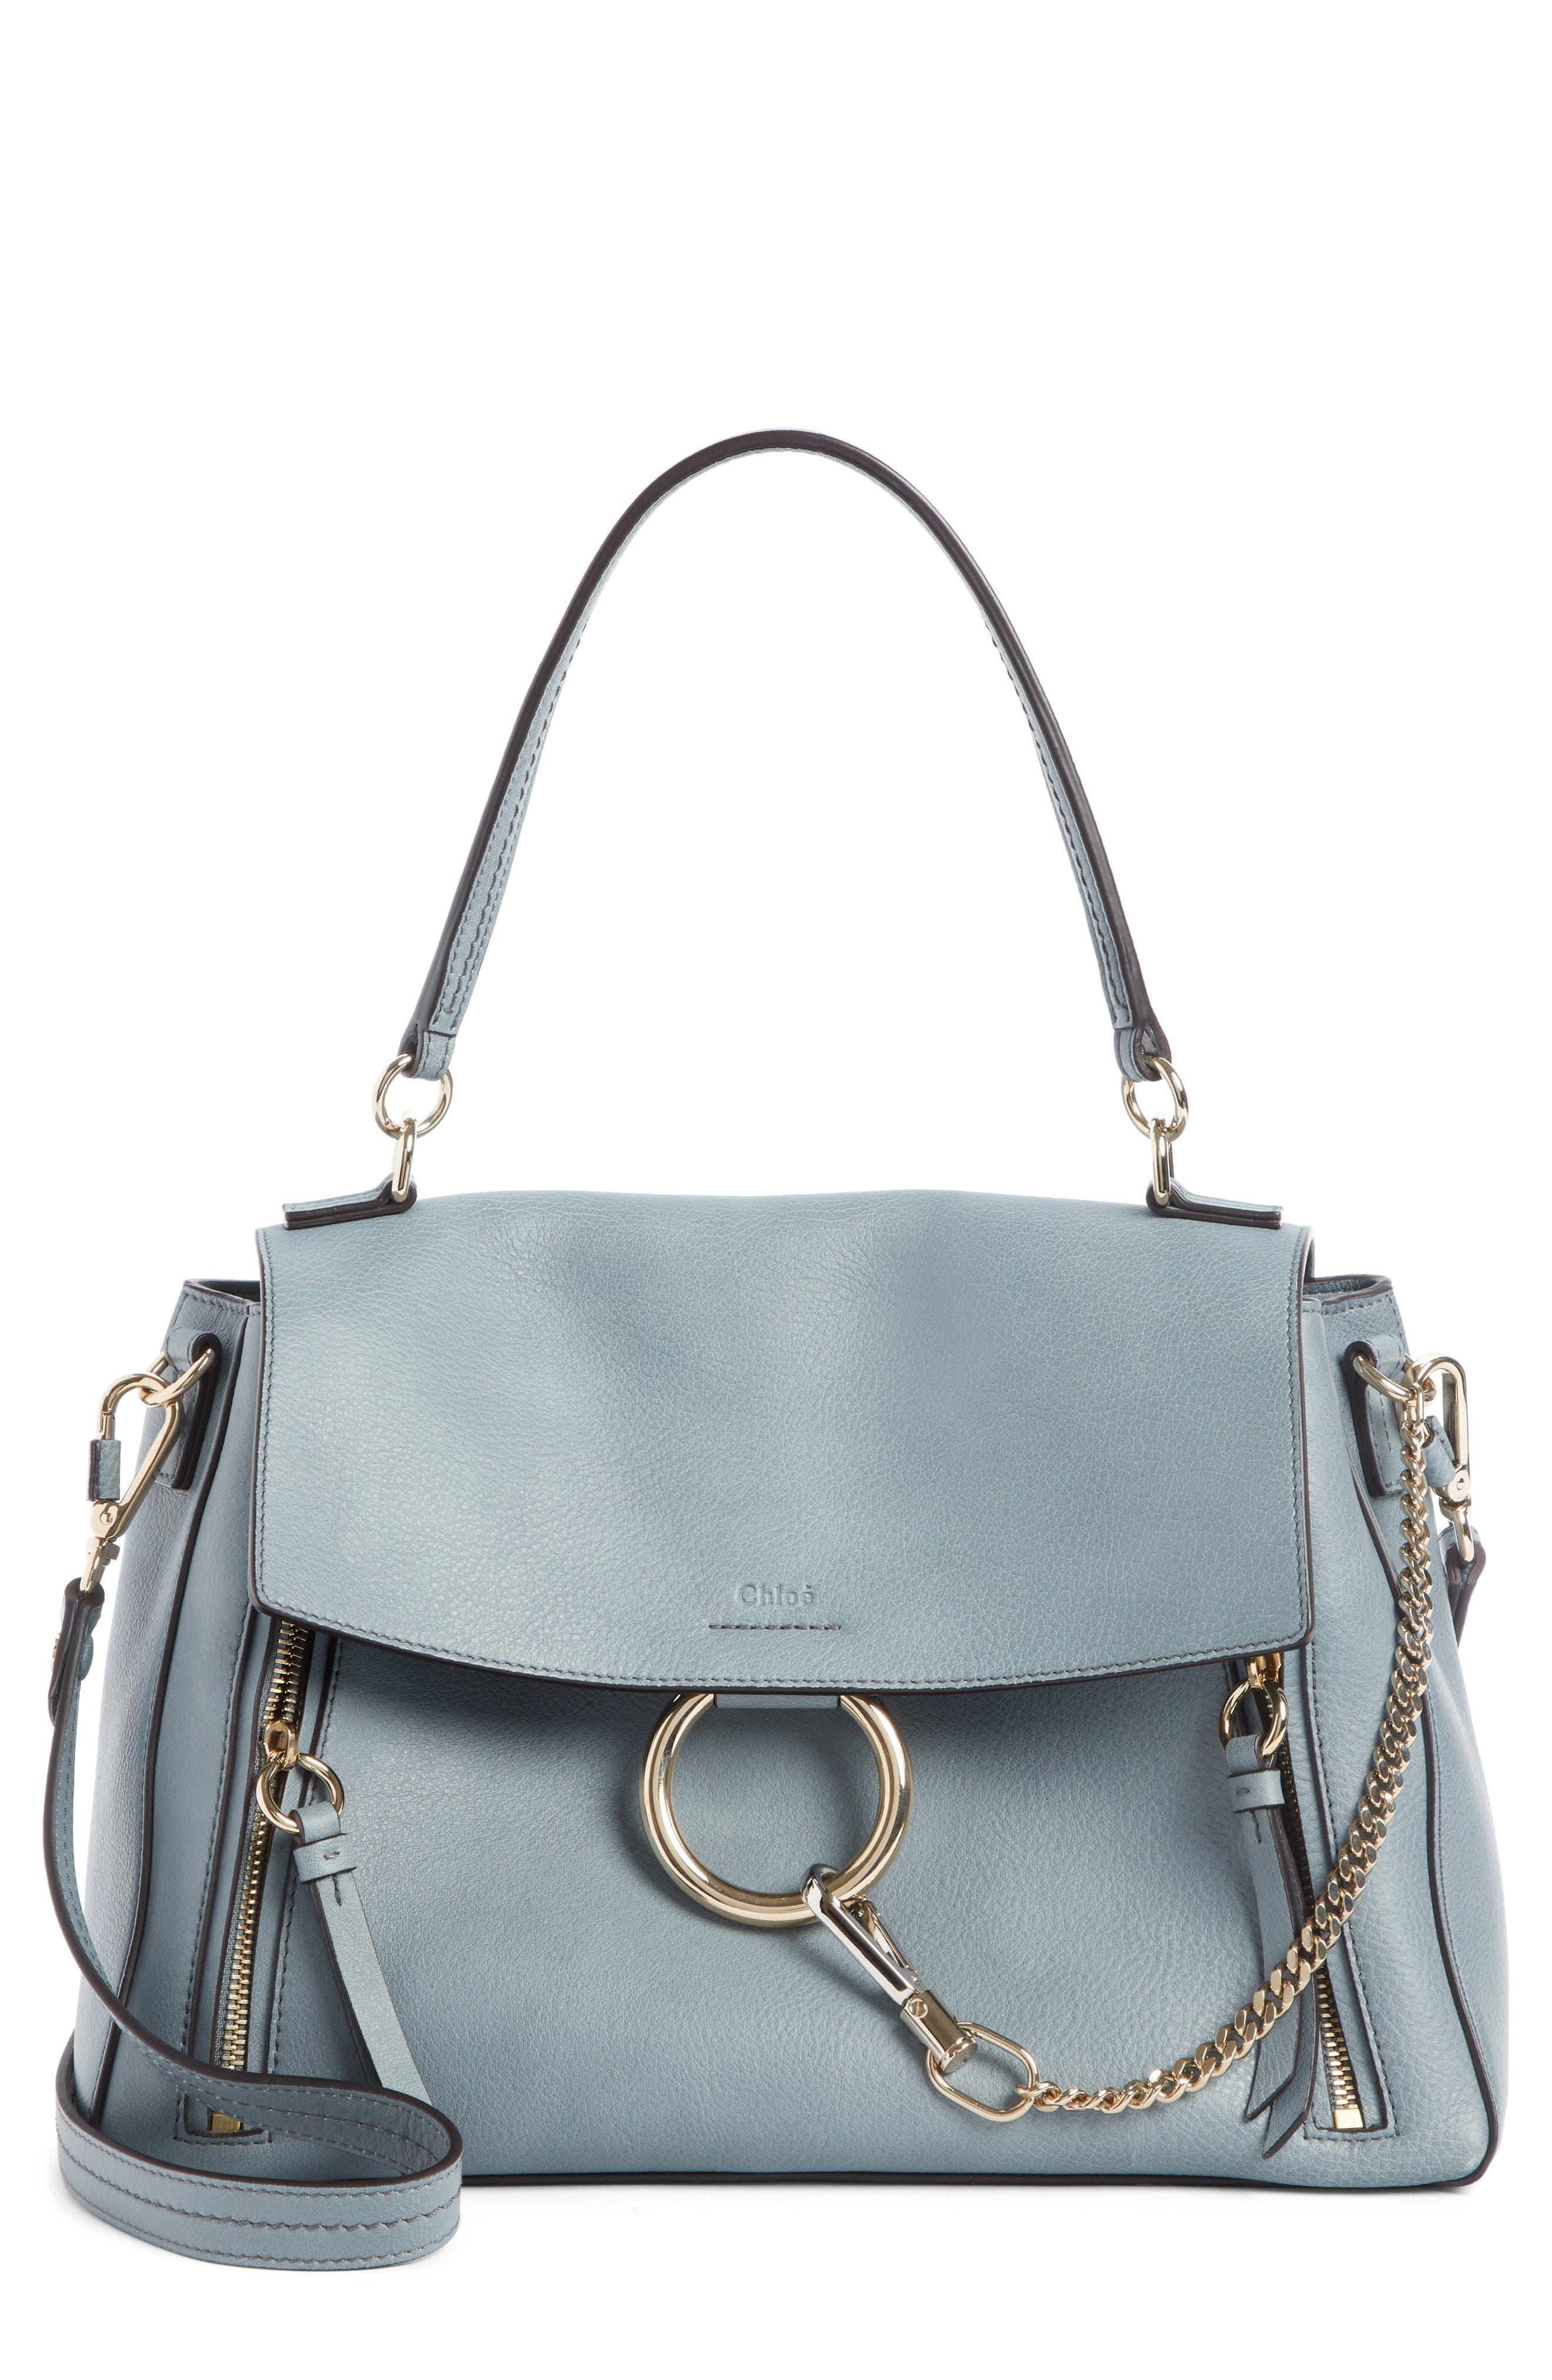 Medium Faye Leather Shoulder Bag,                             Main thumbnail 1, color,                             CLOUDY BLUE